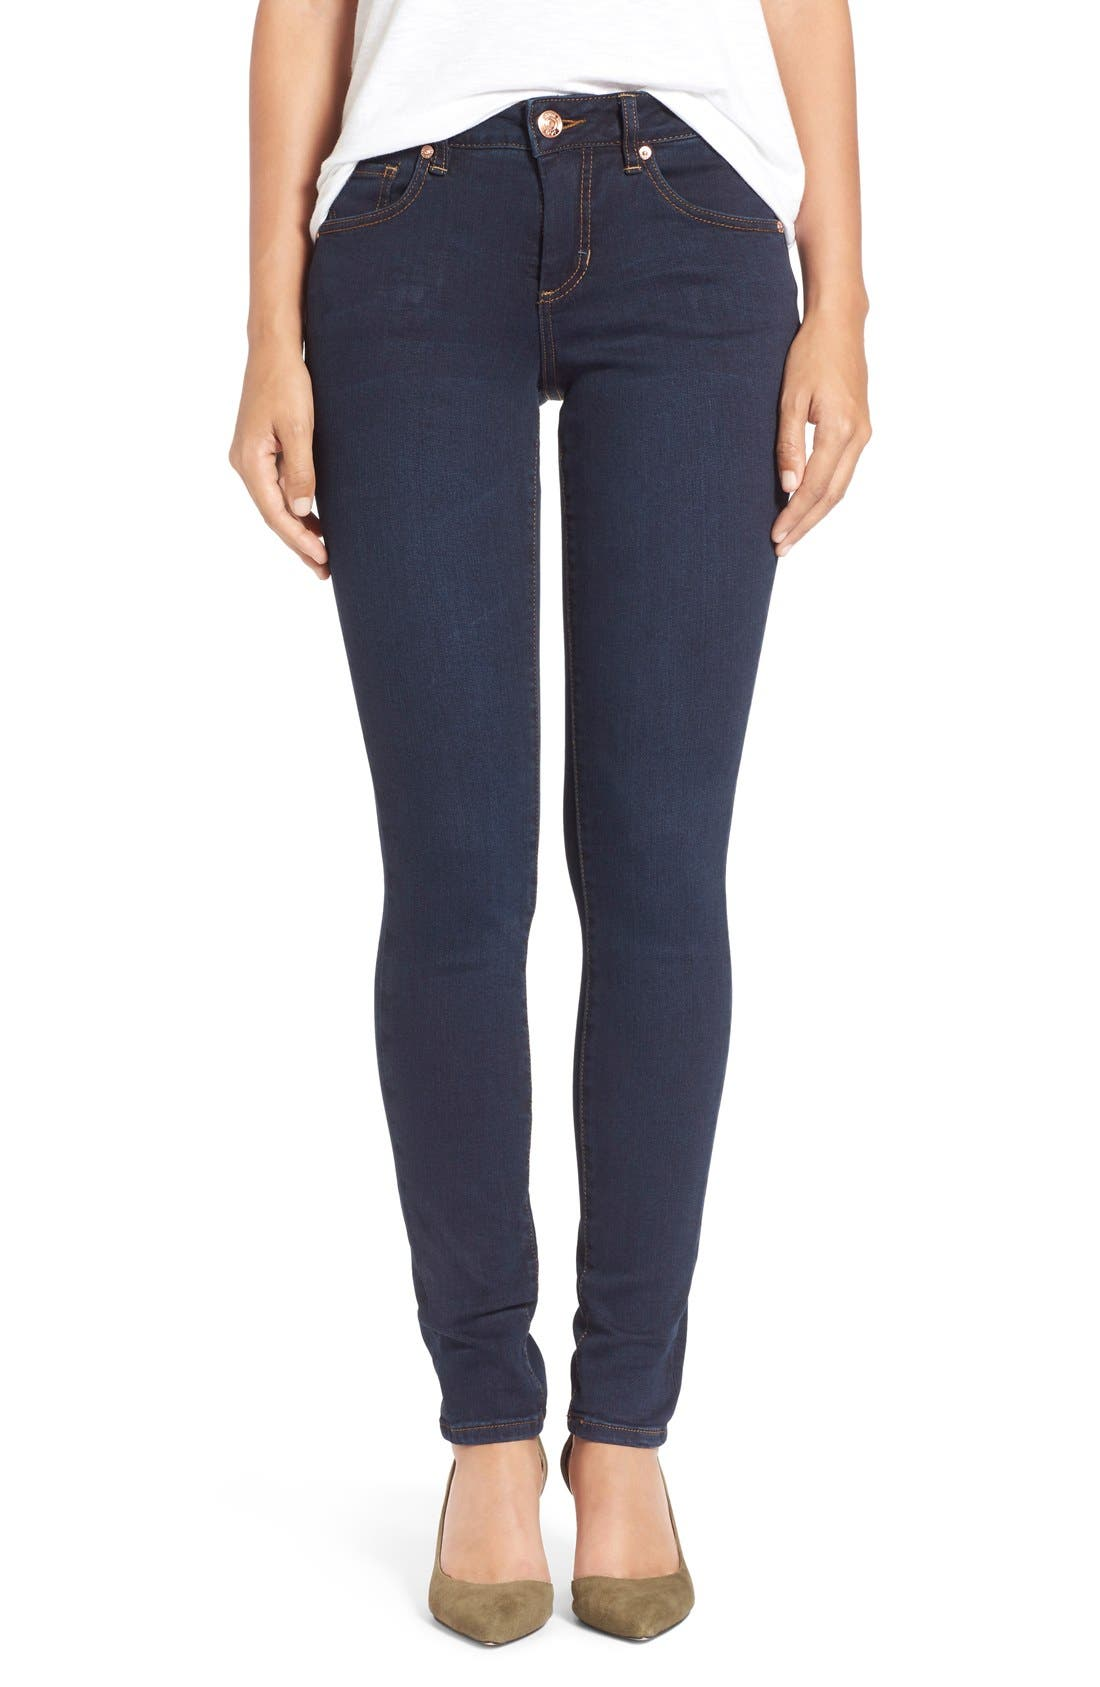 Main Image - Jag Jeans'Westlake' StretchSkinnyJeans (Indigo Steel)